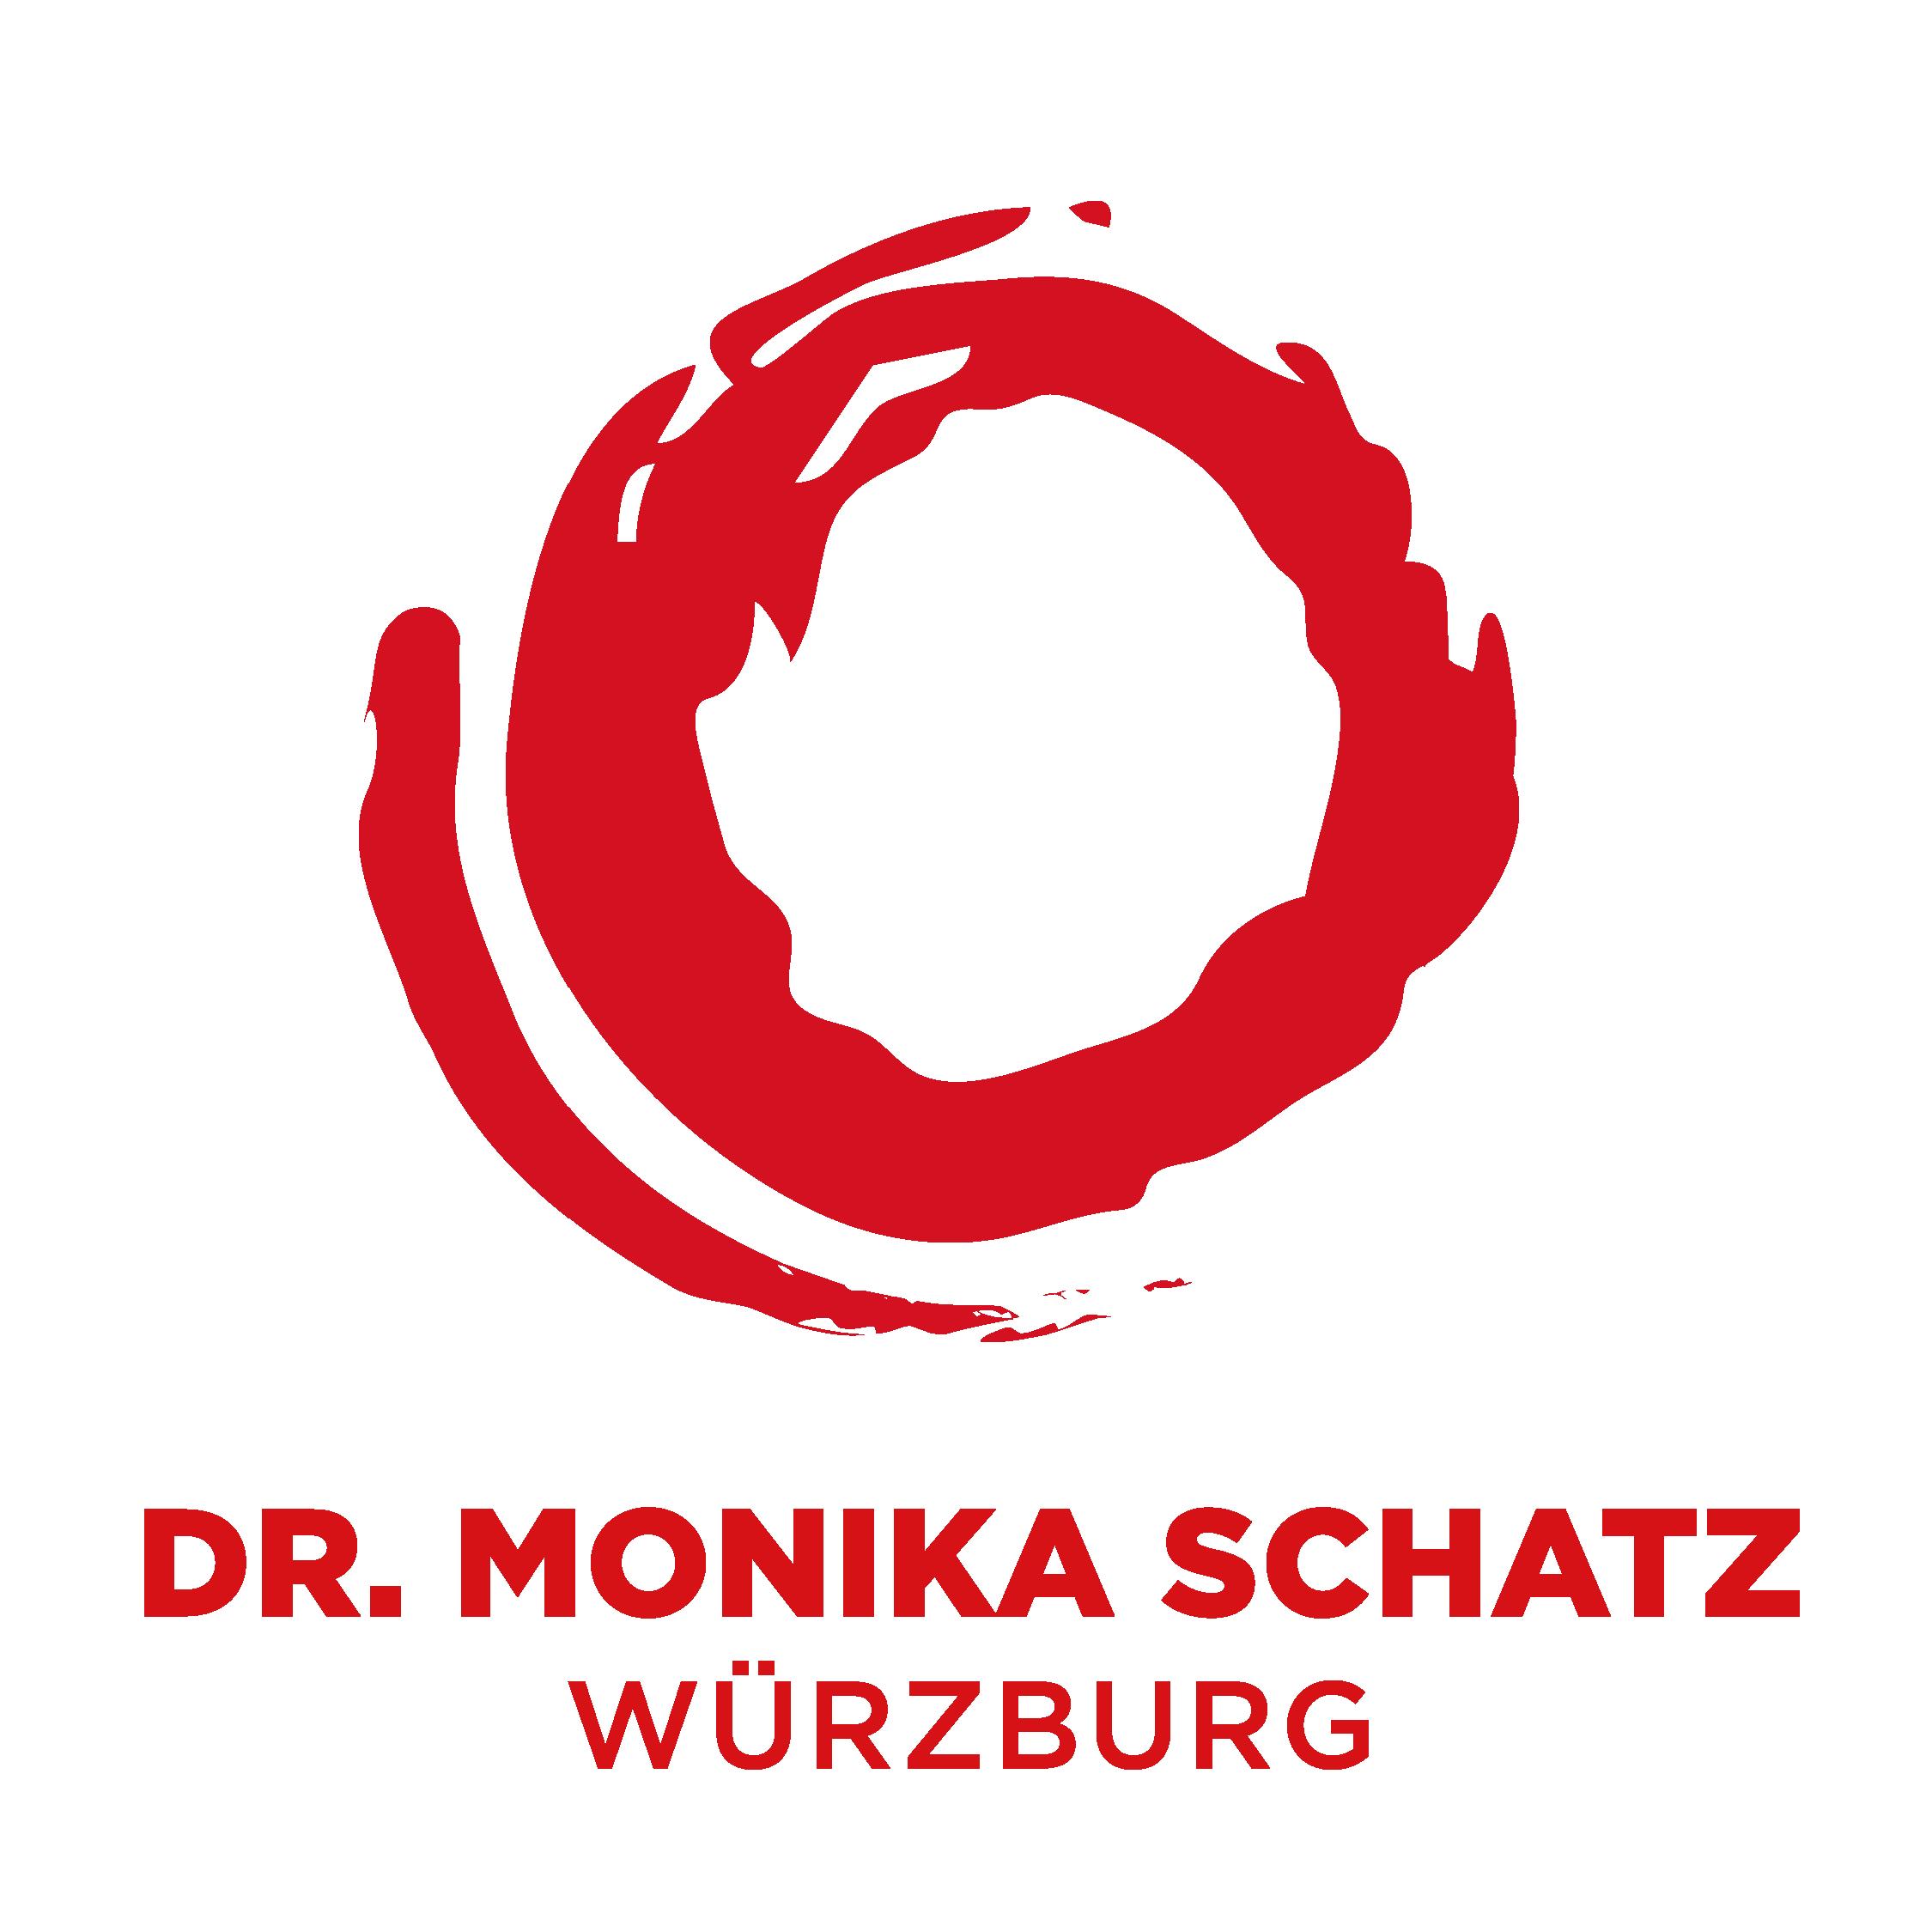 Dr. Monika Schatz, Würzburg